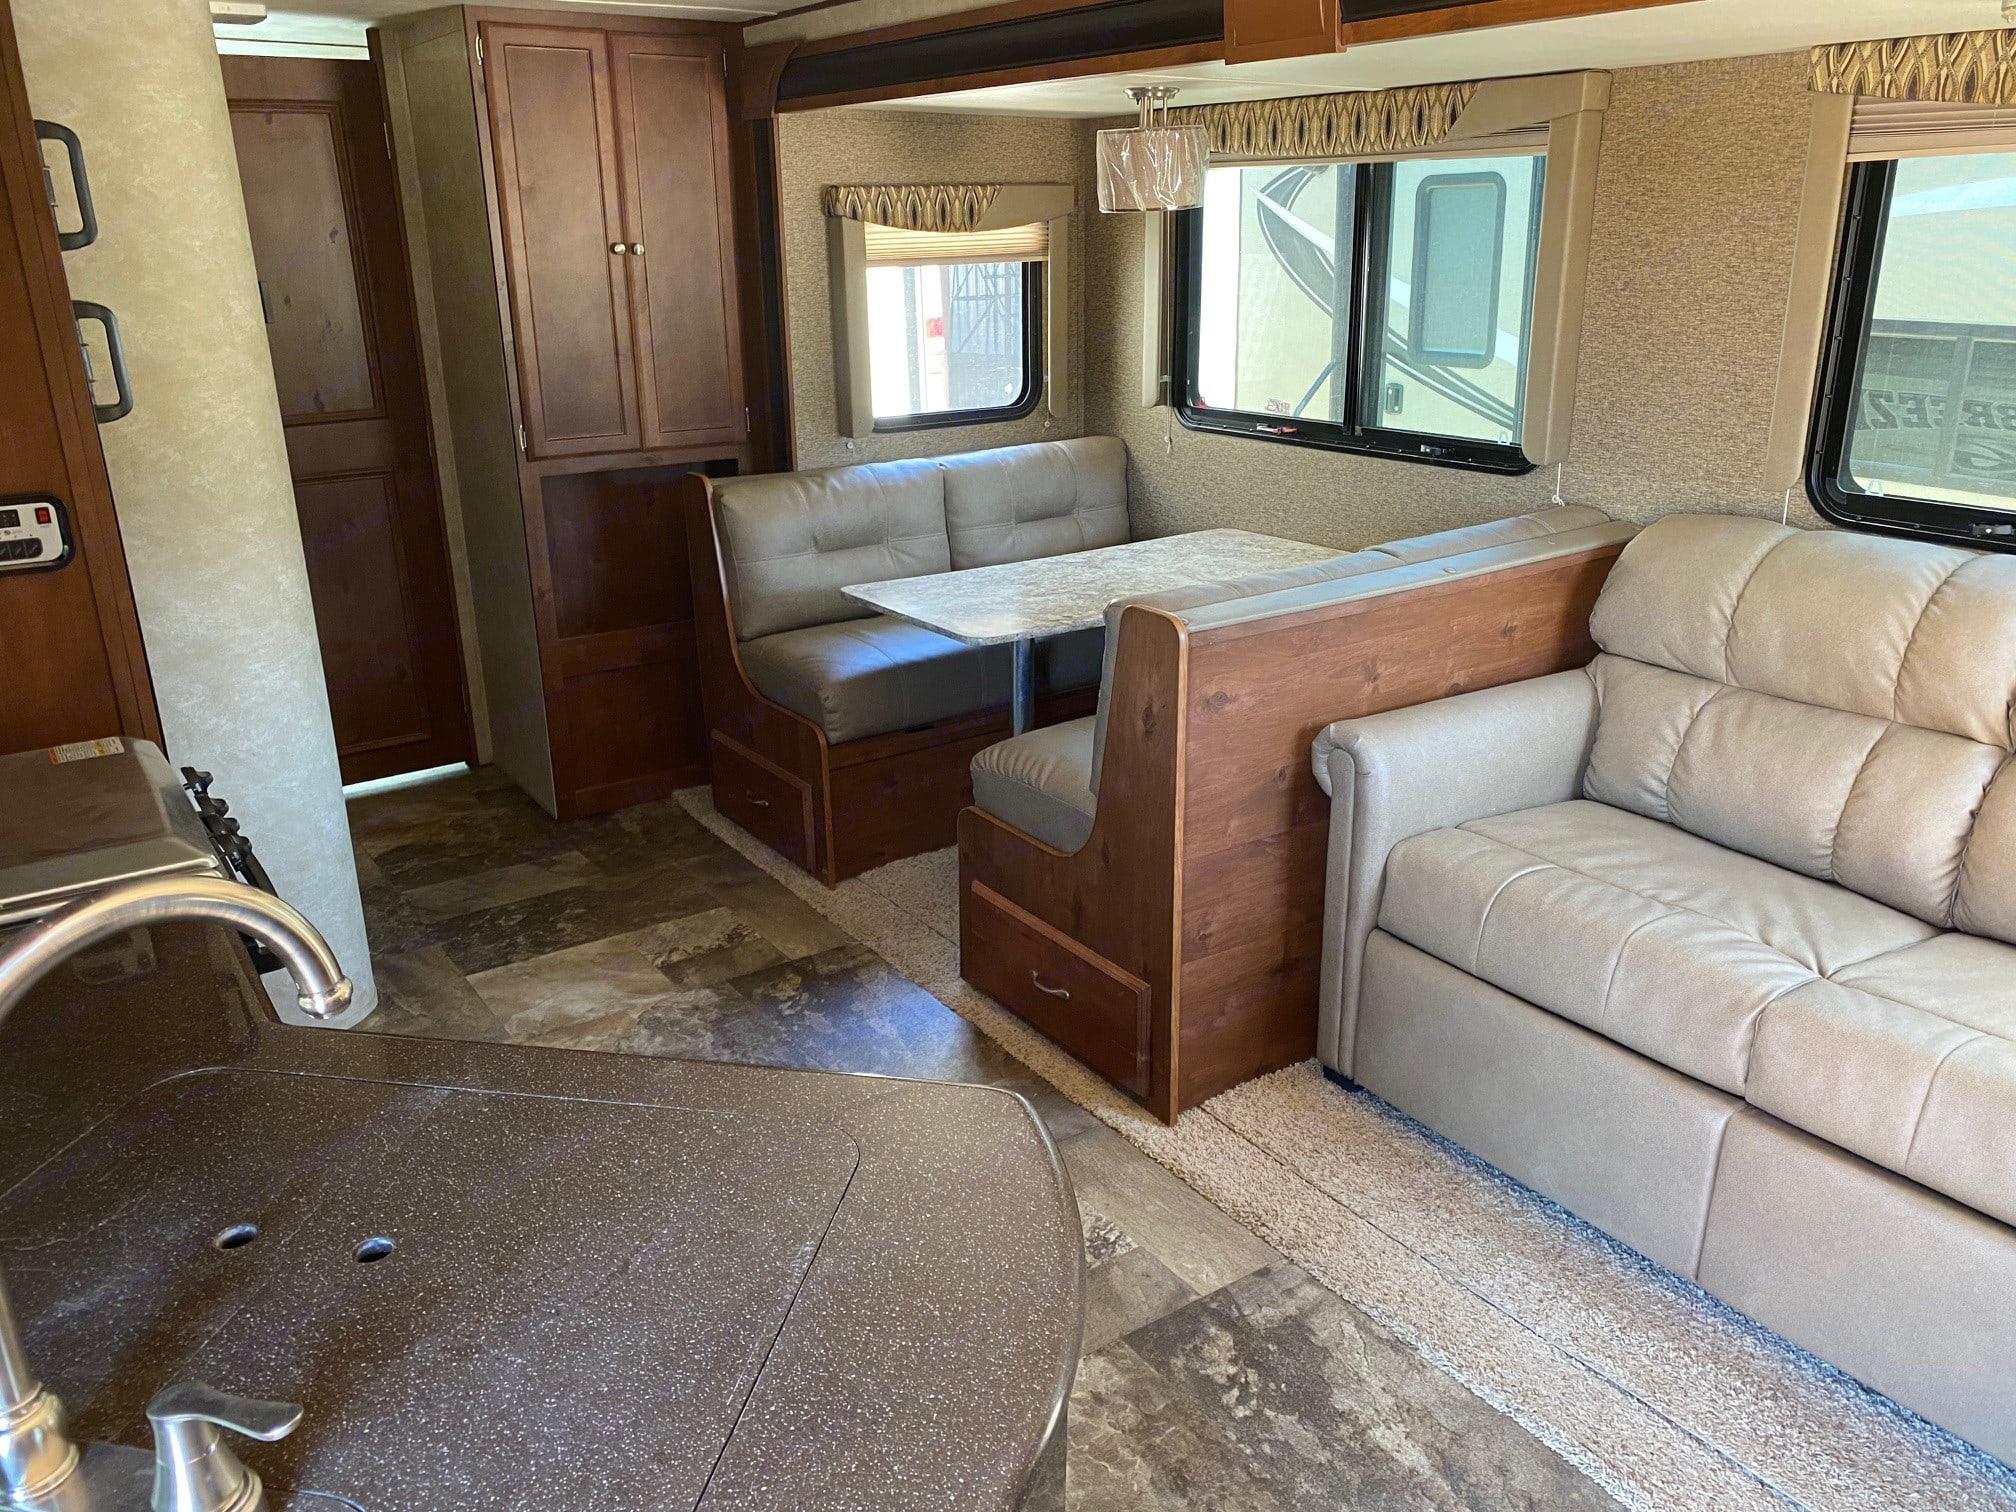 Living Room/Dining Room. Gulf Stream Gulf Breeze 2016